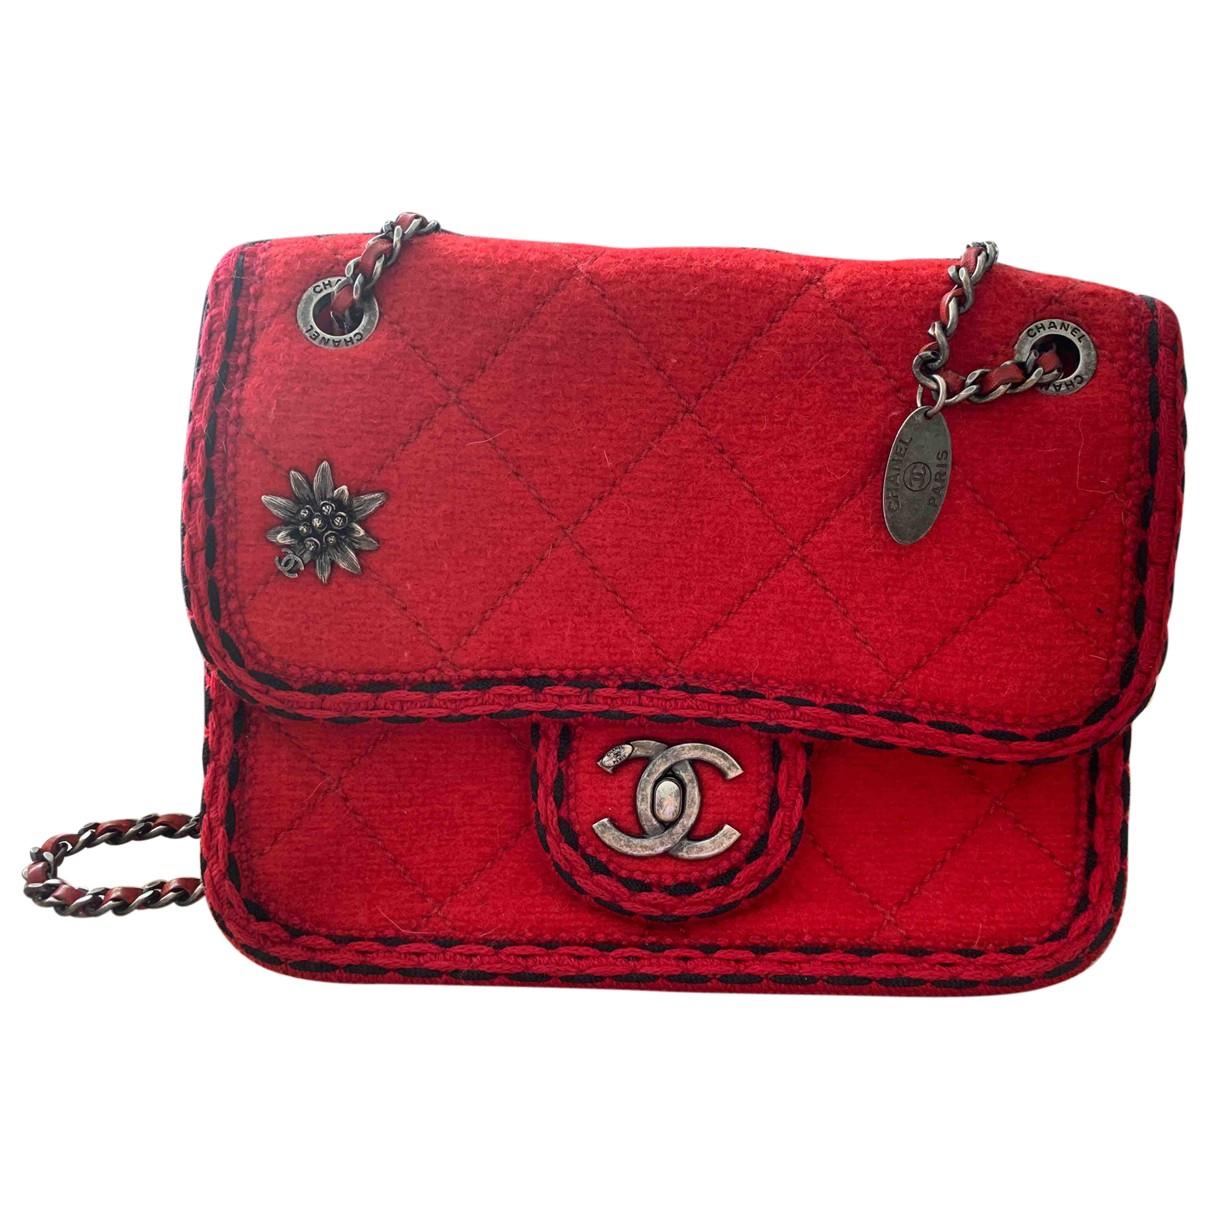 Chanel Timeless/Classique Handtasche in  Rot Tweed